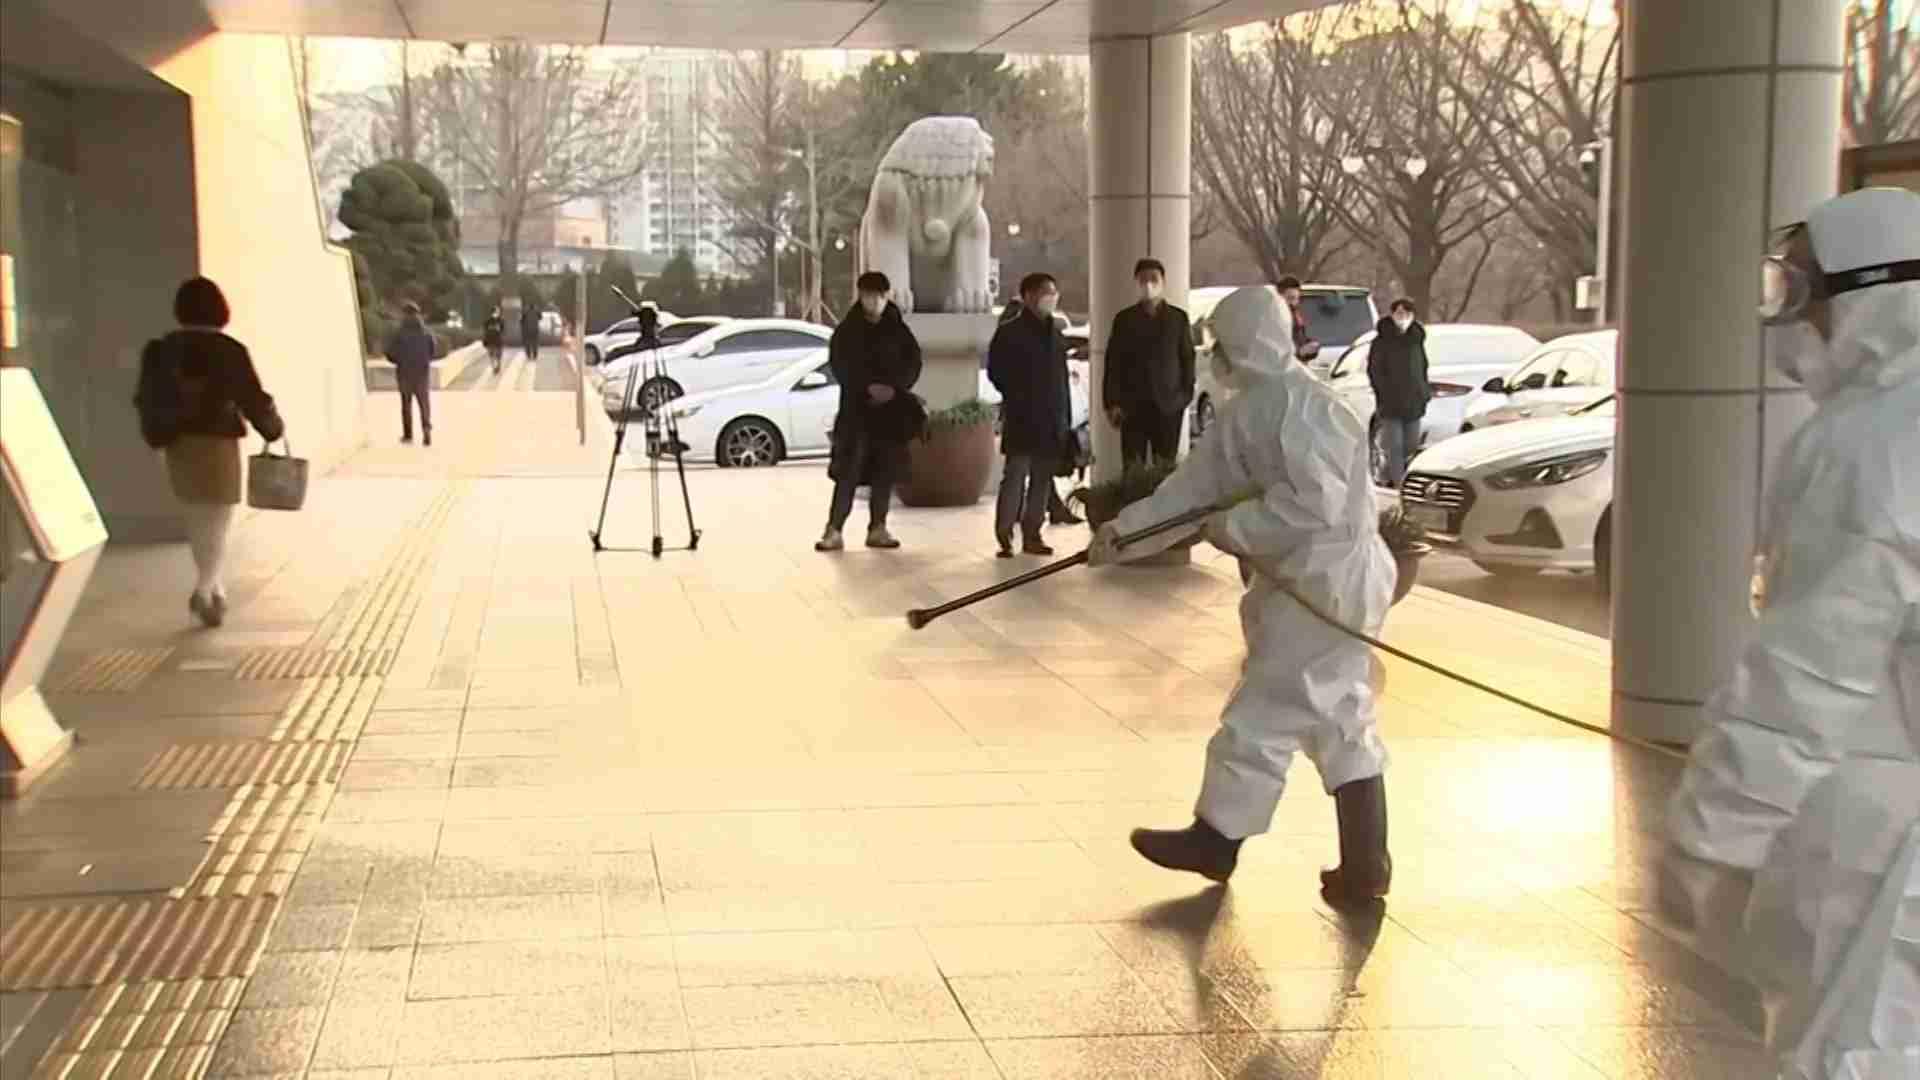 America needs to prepare for Coronavirus arrival, state is vigilant